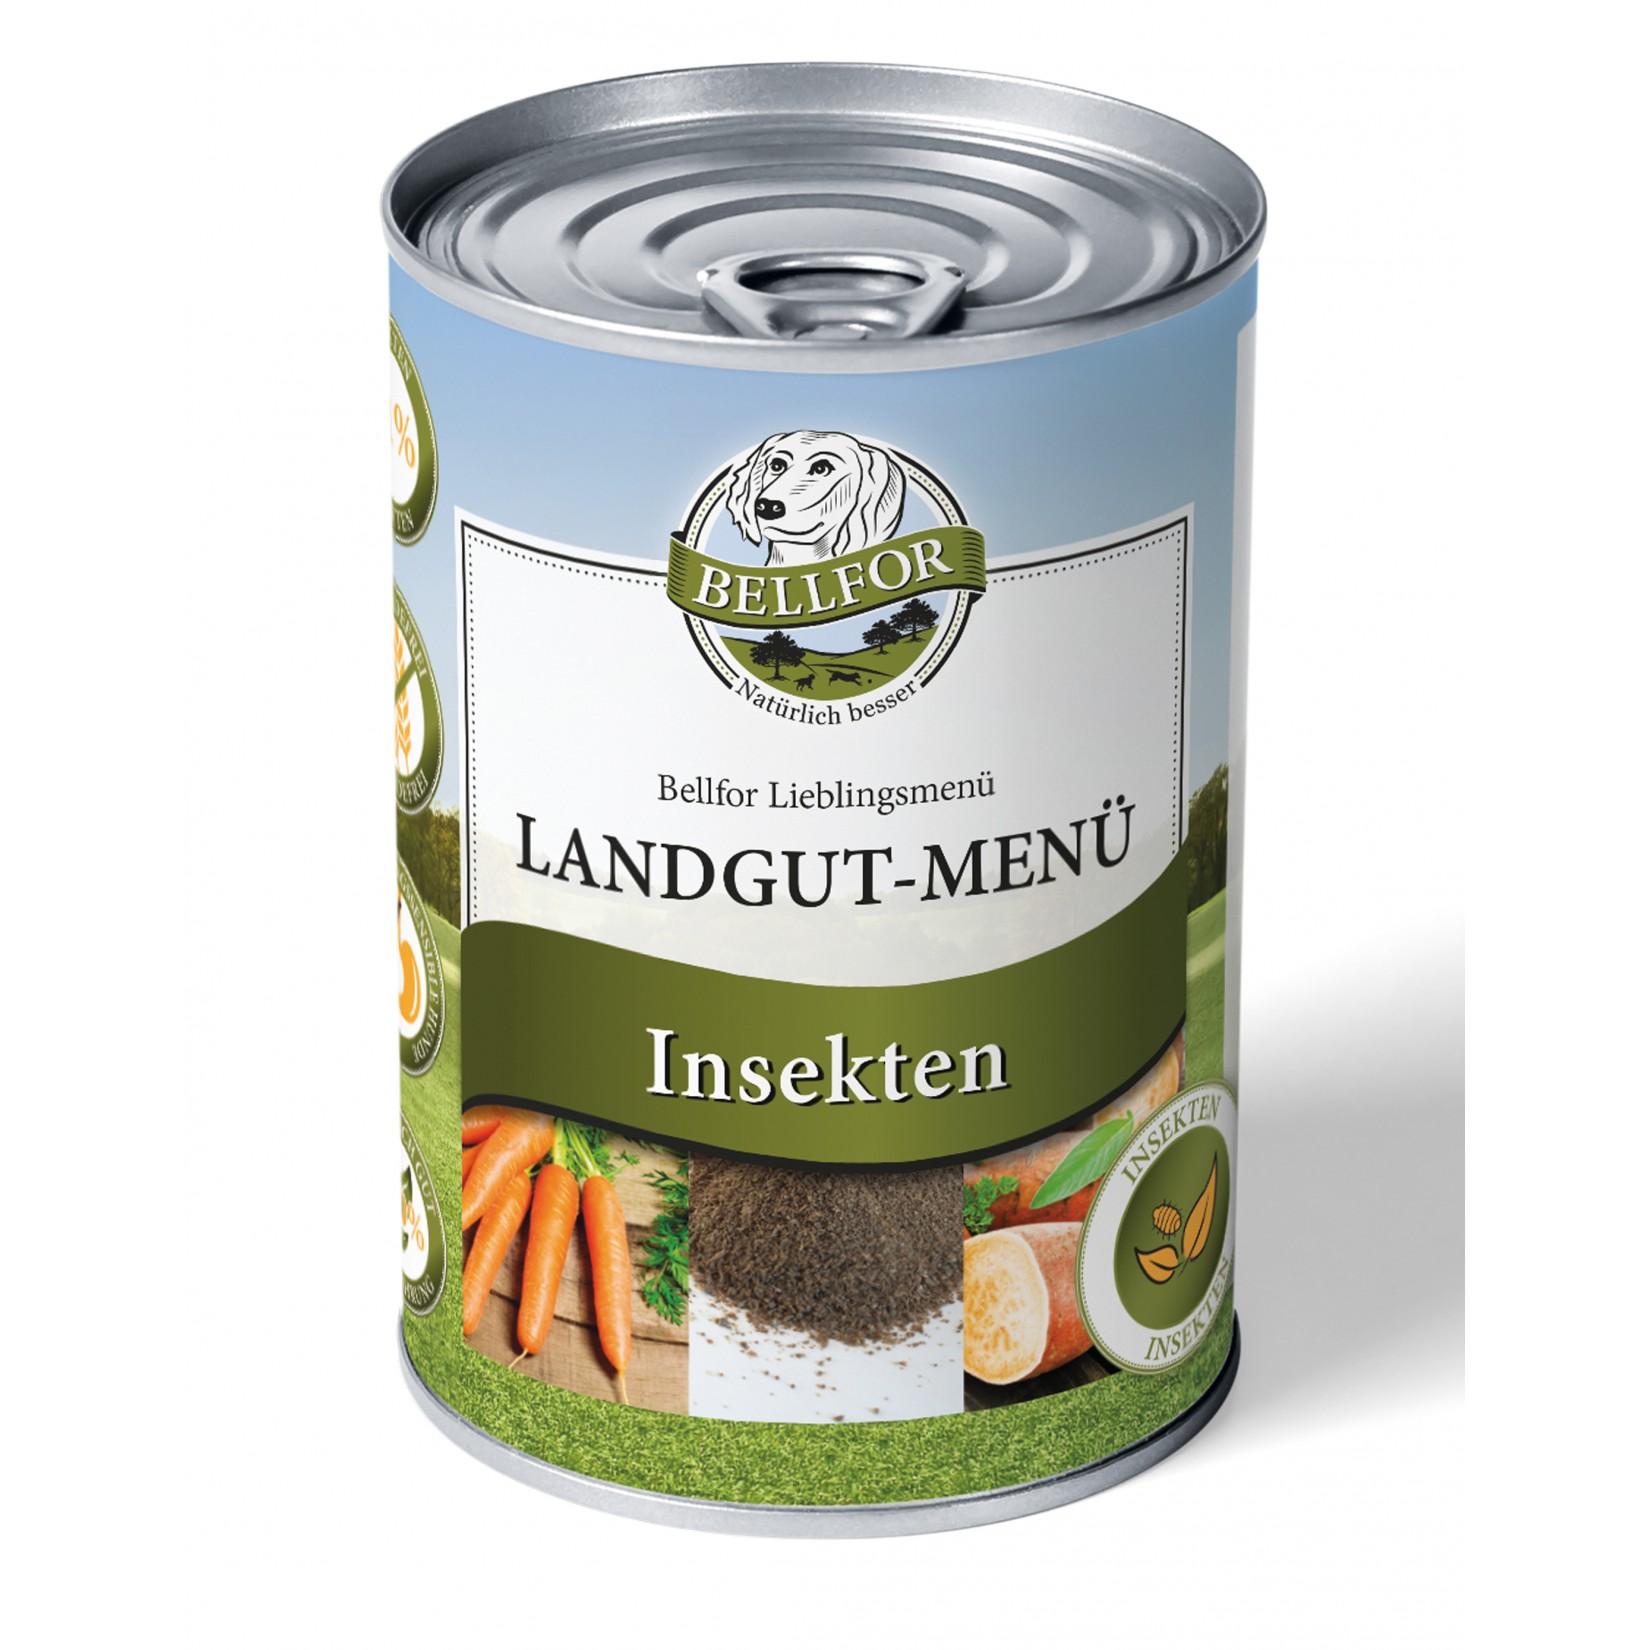 Bellfor Landgut-Menü